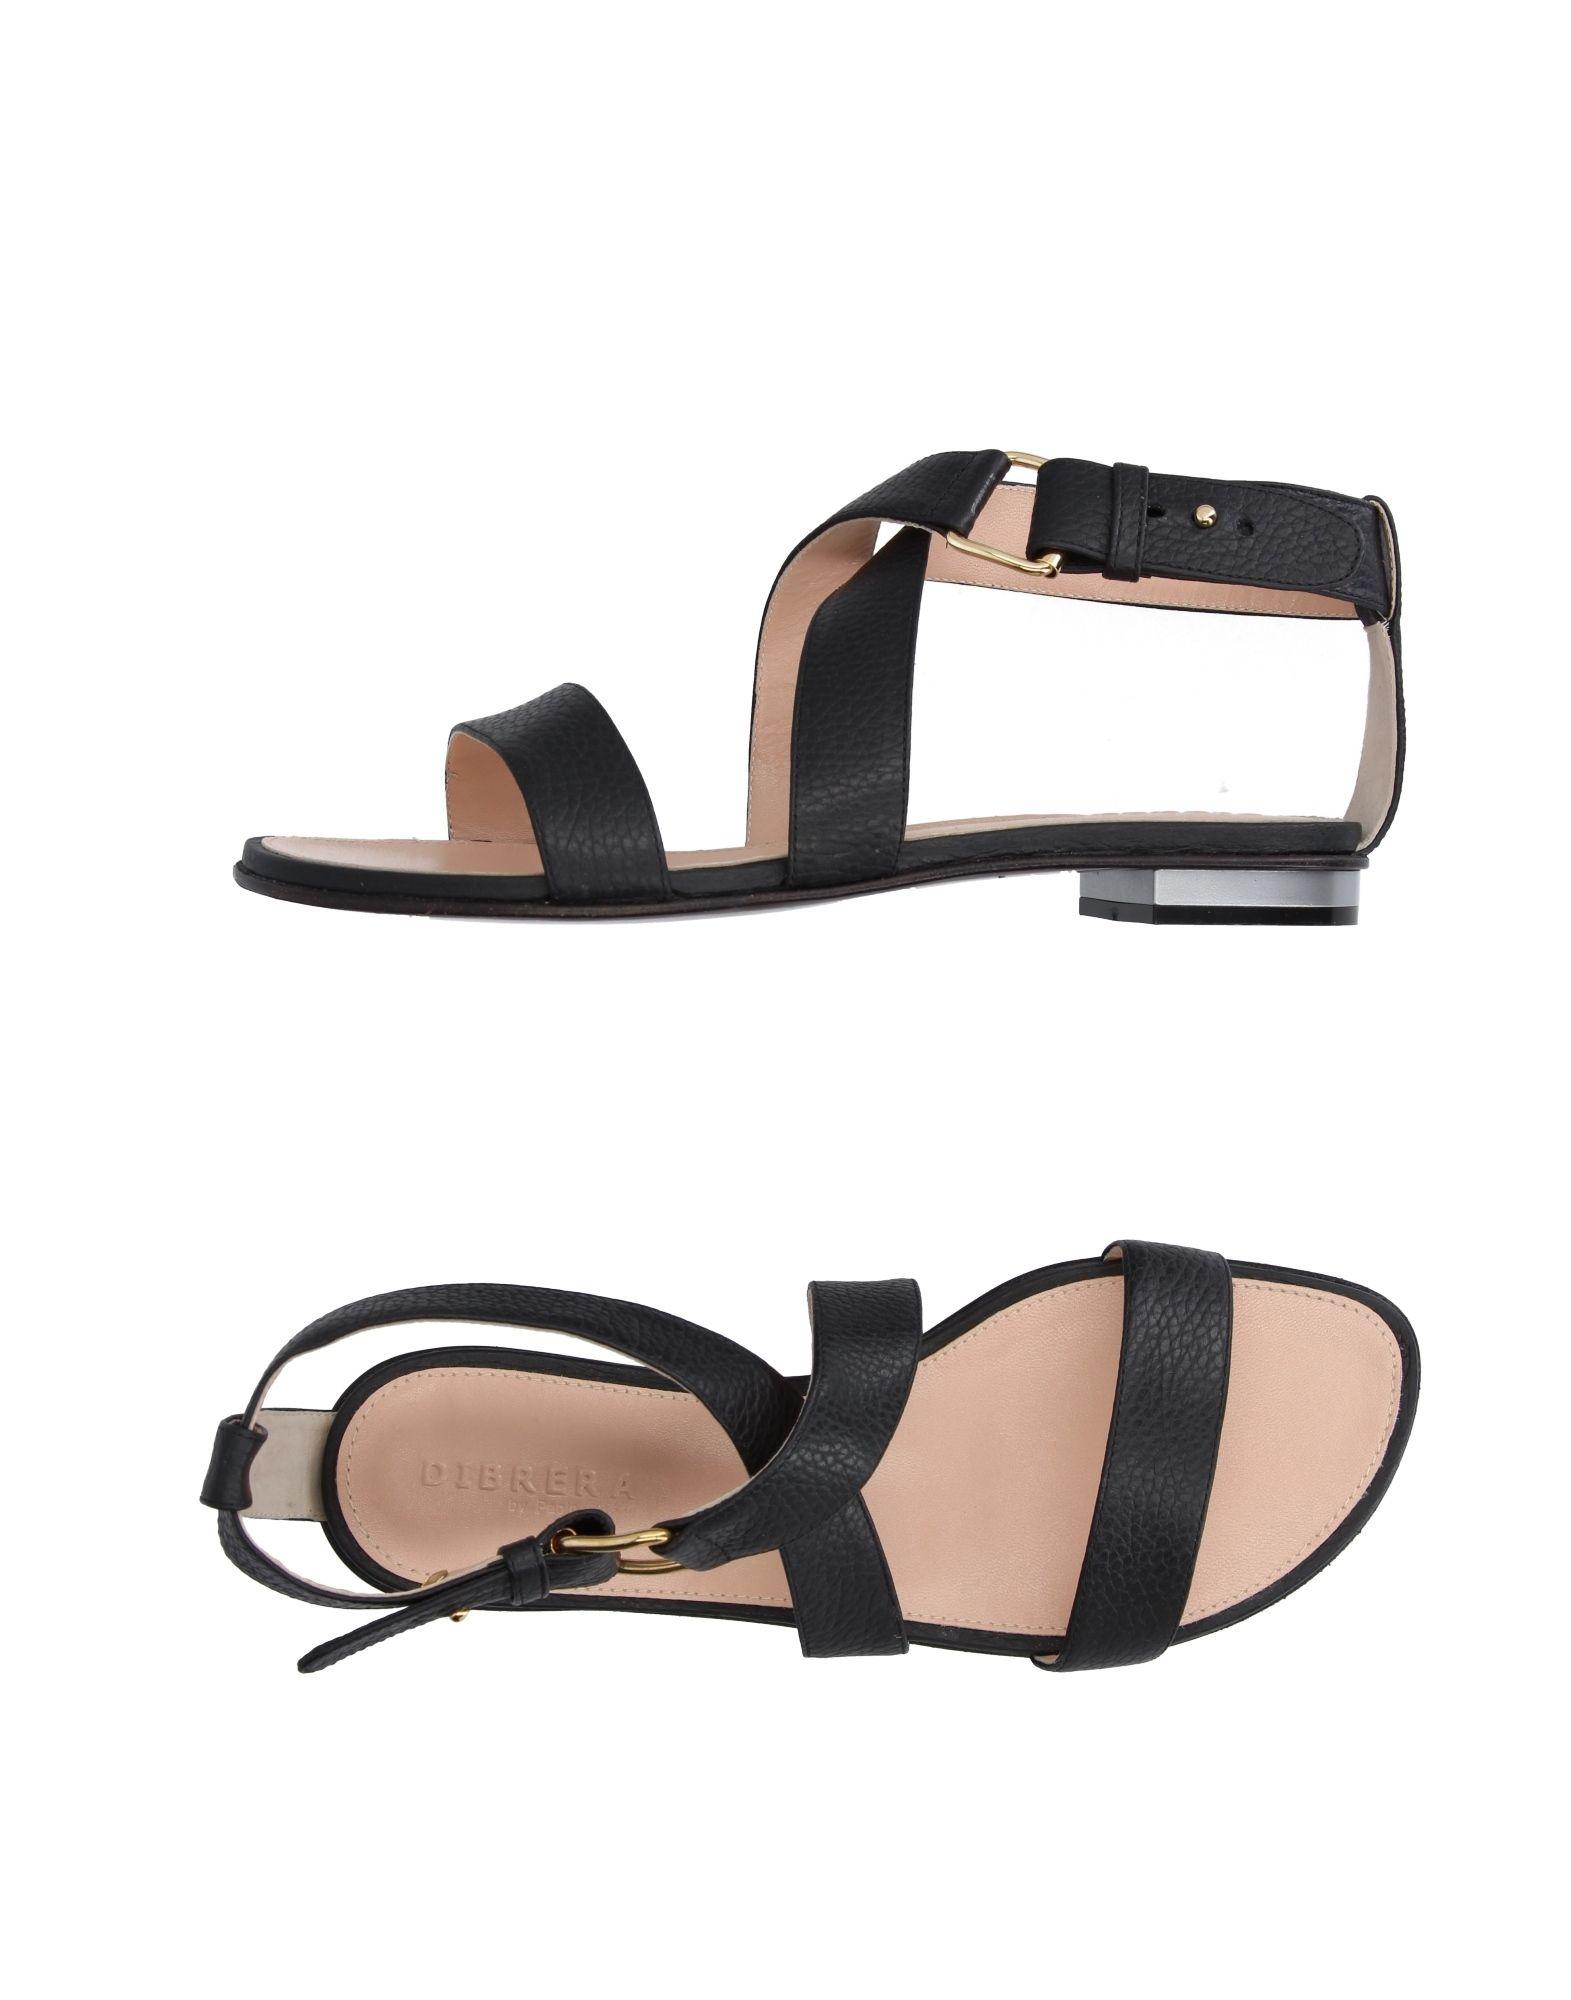 Dibrera By Paolo Zanoli Sandalen Damen  11203254CN Gute Qualität beliebte Schuhe